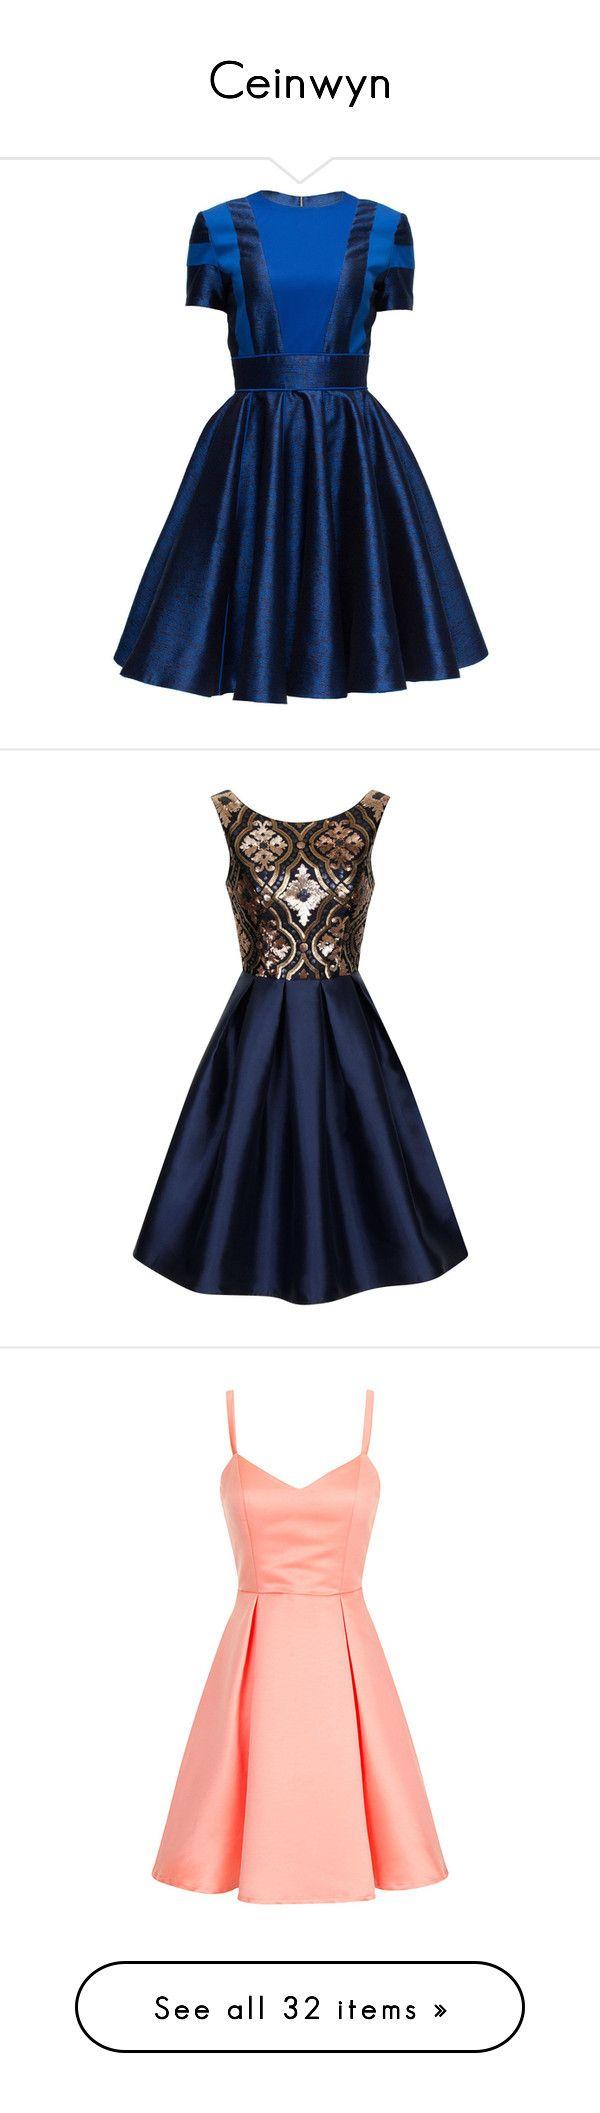 """Ceinwyn"" by vanessamuniz ❤ liked on Polyvore featuring dresses, lattori, short dresses, royal blue short dress, blue dress, mini dress, short blue dresses, blue mini dress, navy and women"